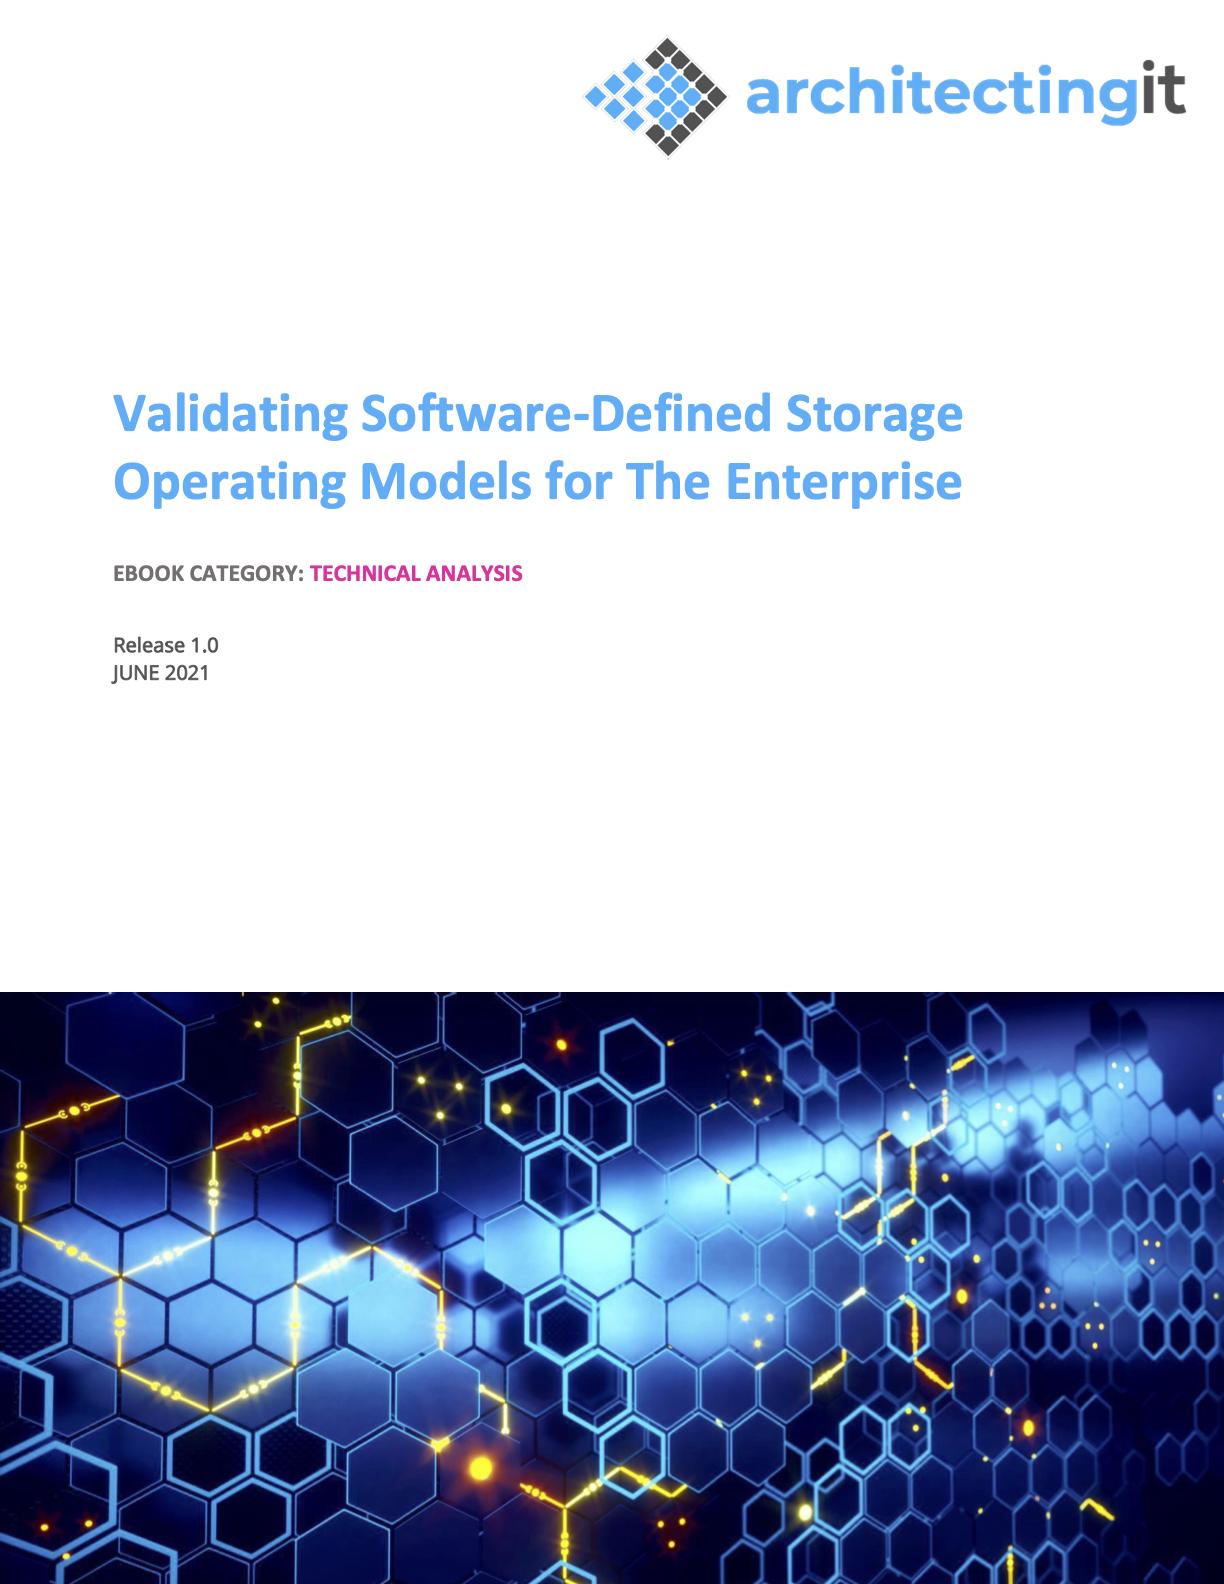 Validating Software-Defined Storage Operating Models for the Enterprise